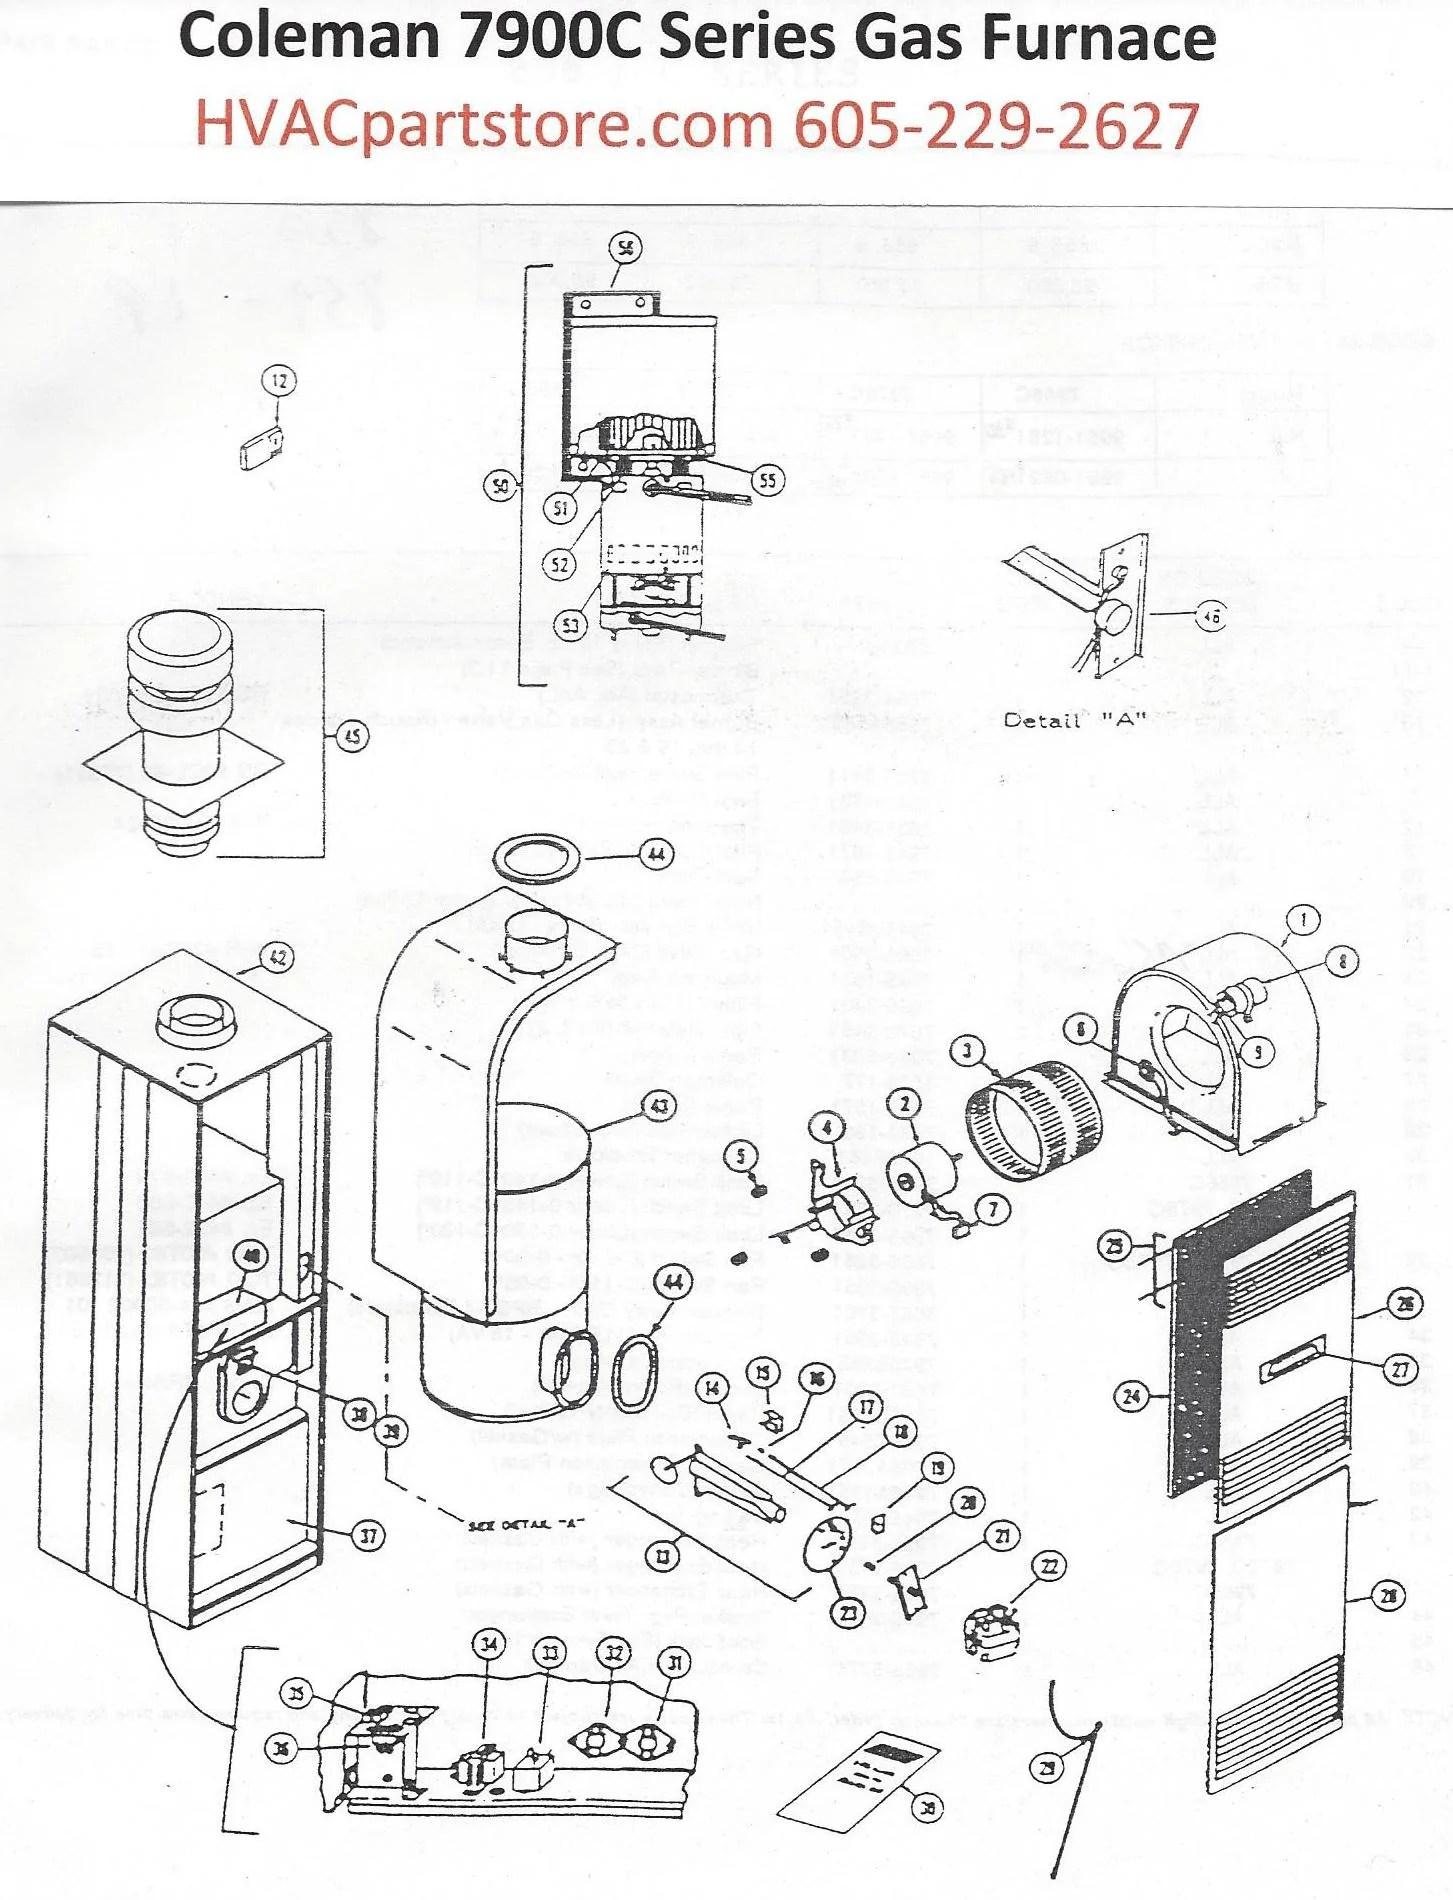 7975C856 Coleman Gas Furnace Parts – HVACpartstore